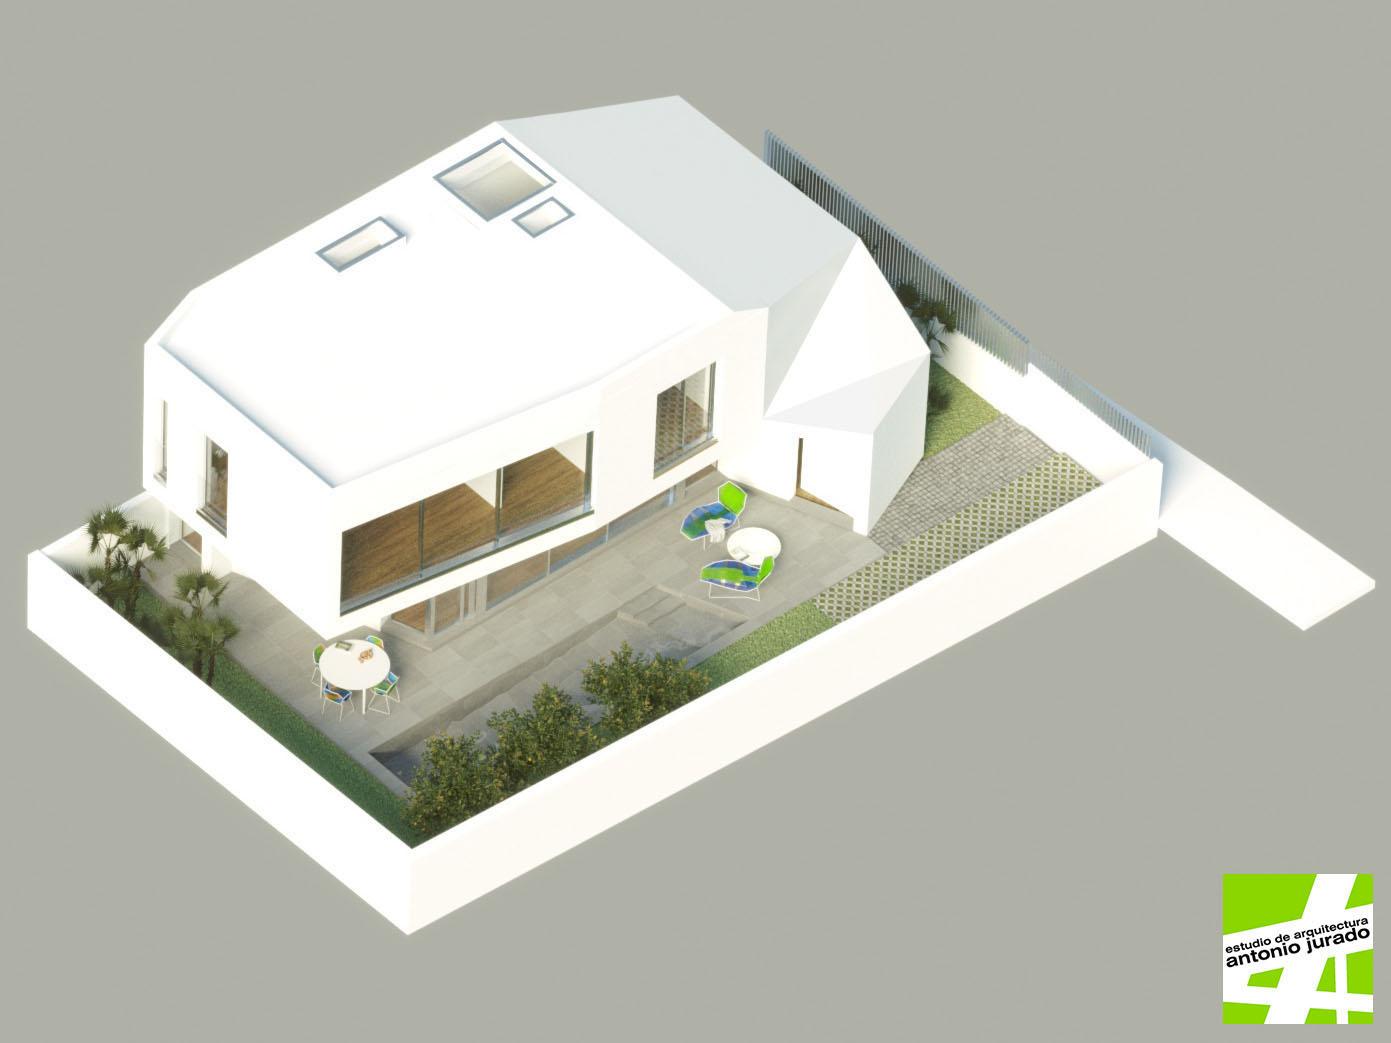 casa-ob-house-alhaurin-malaga-arquitecto-antonio-jurado-11